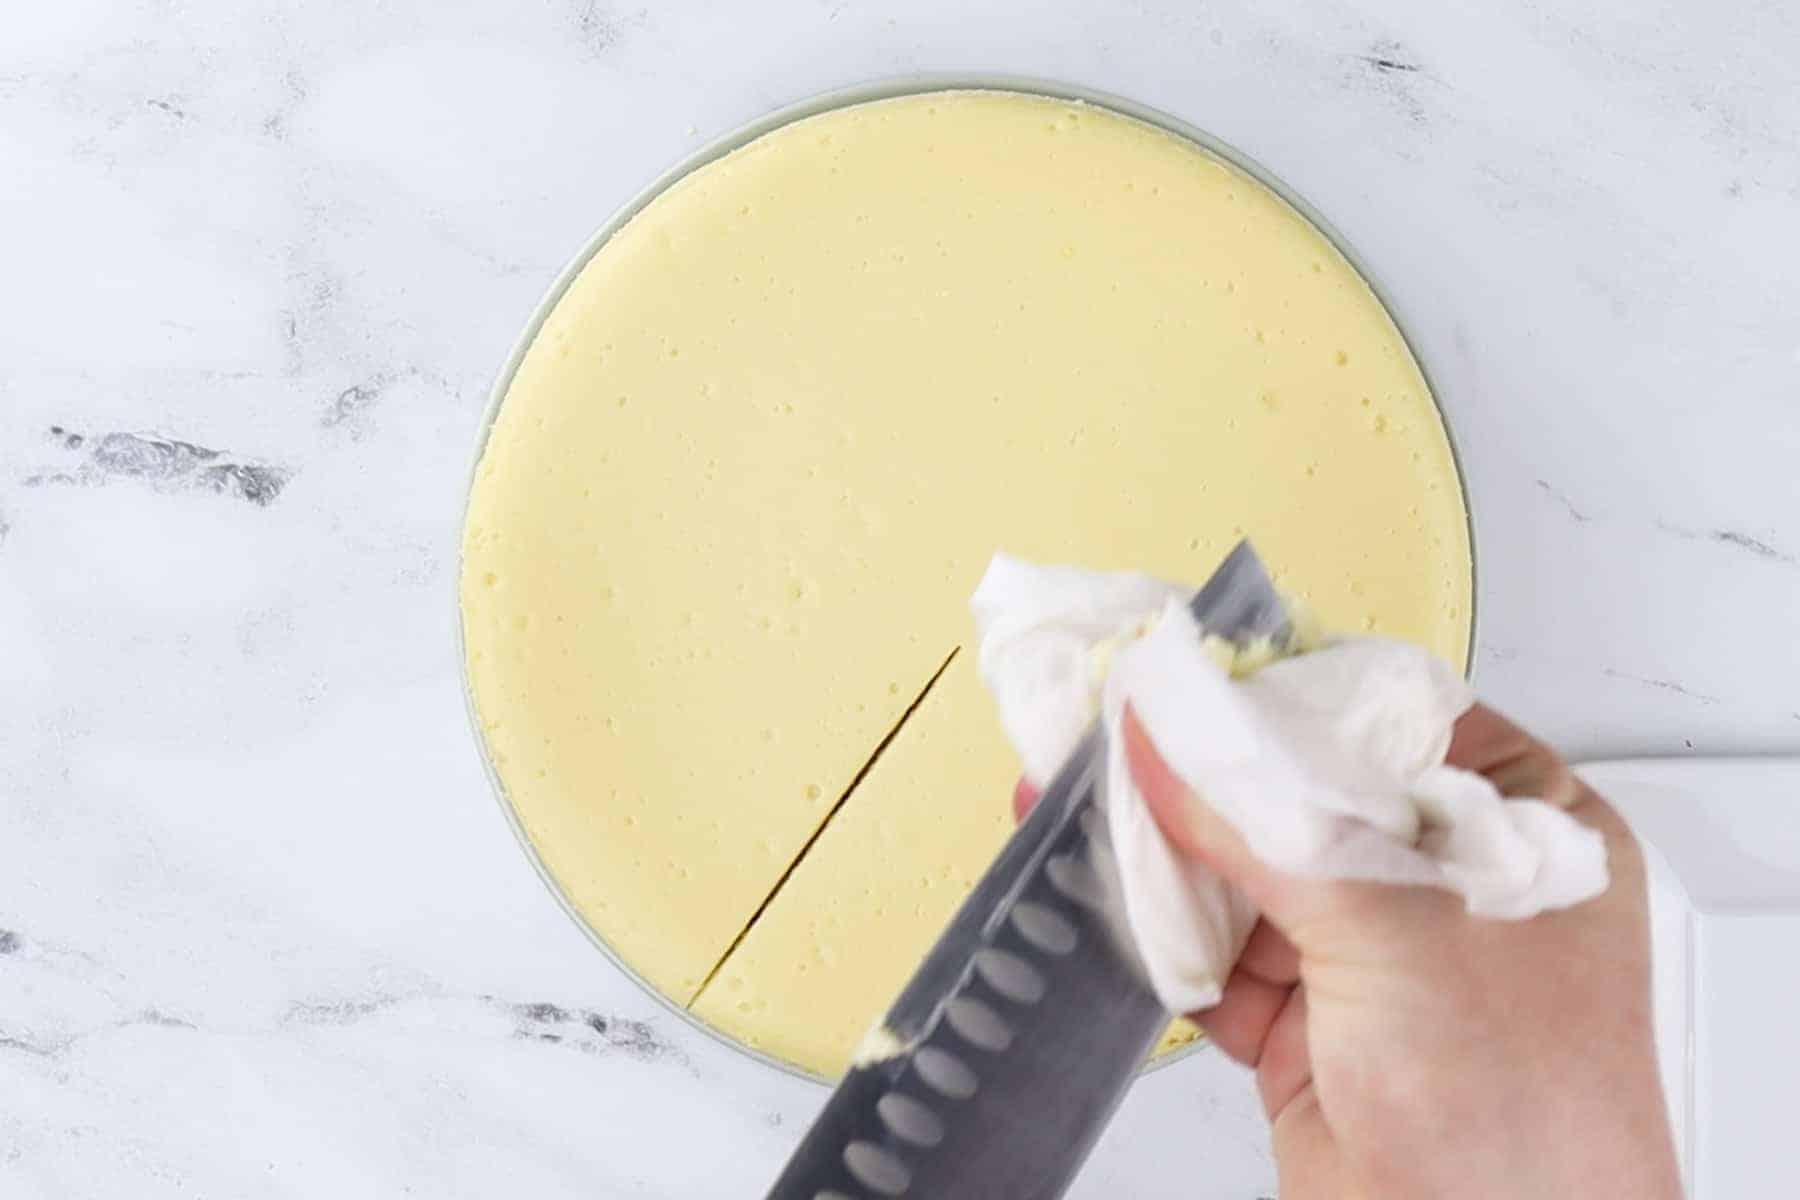 Clean knife after each cut